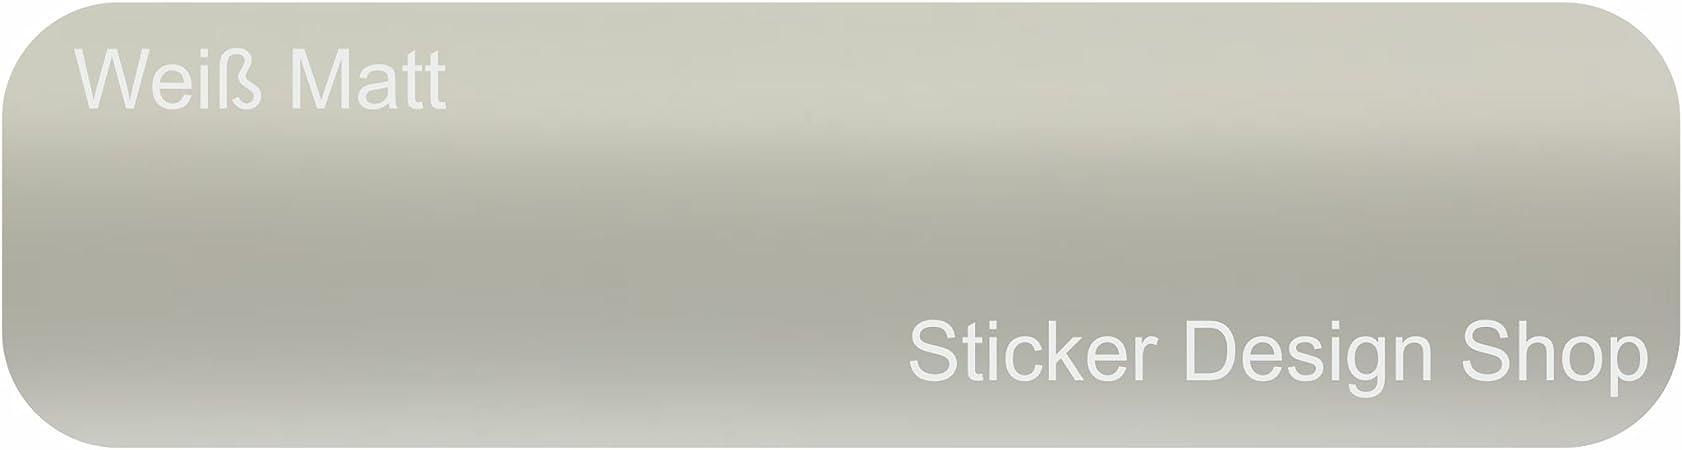 ORACAL 631 5 m x 31,5 cm blanco mate 010 pantalla para plotter Manualidades – Lámina para muebles pantalla: Amazon.es: Coche y moto